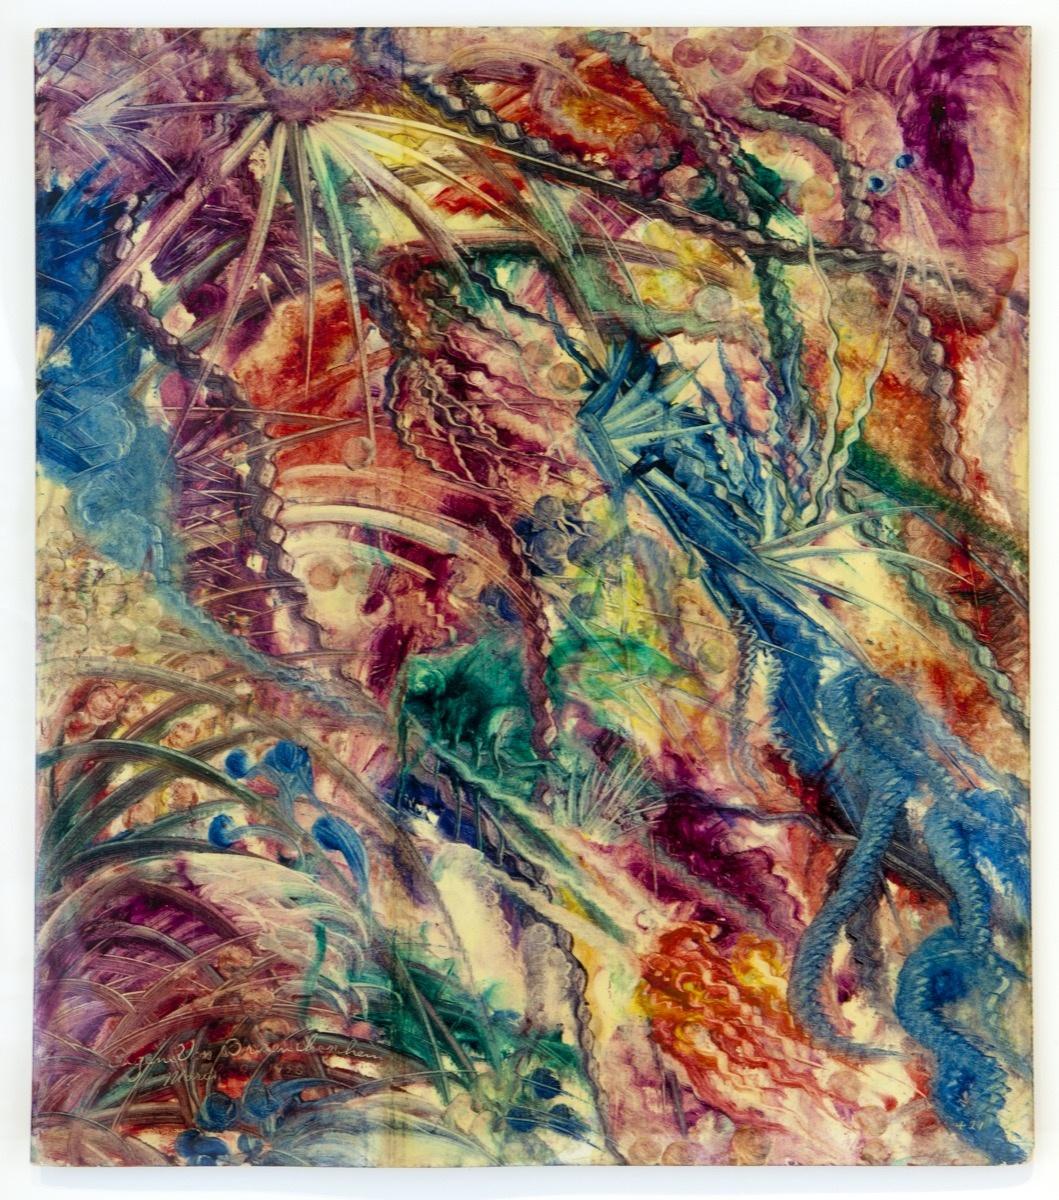 Eugene von Bruenchenhein, Untitled (abstraction), 1956. Courtesy of Andrew Edlin Gallery.